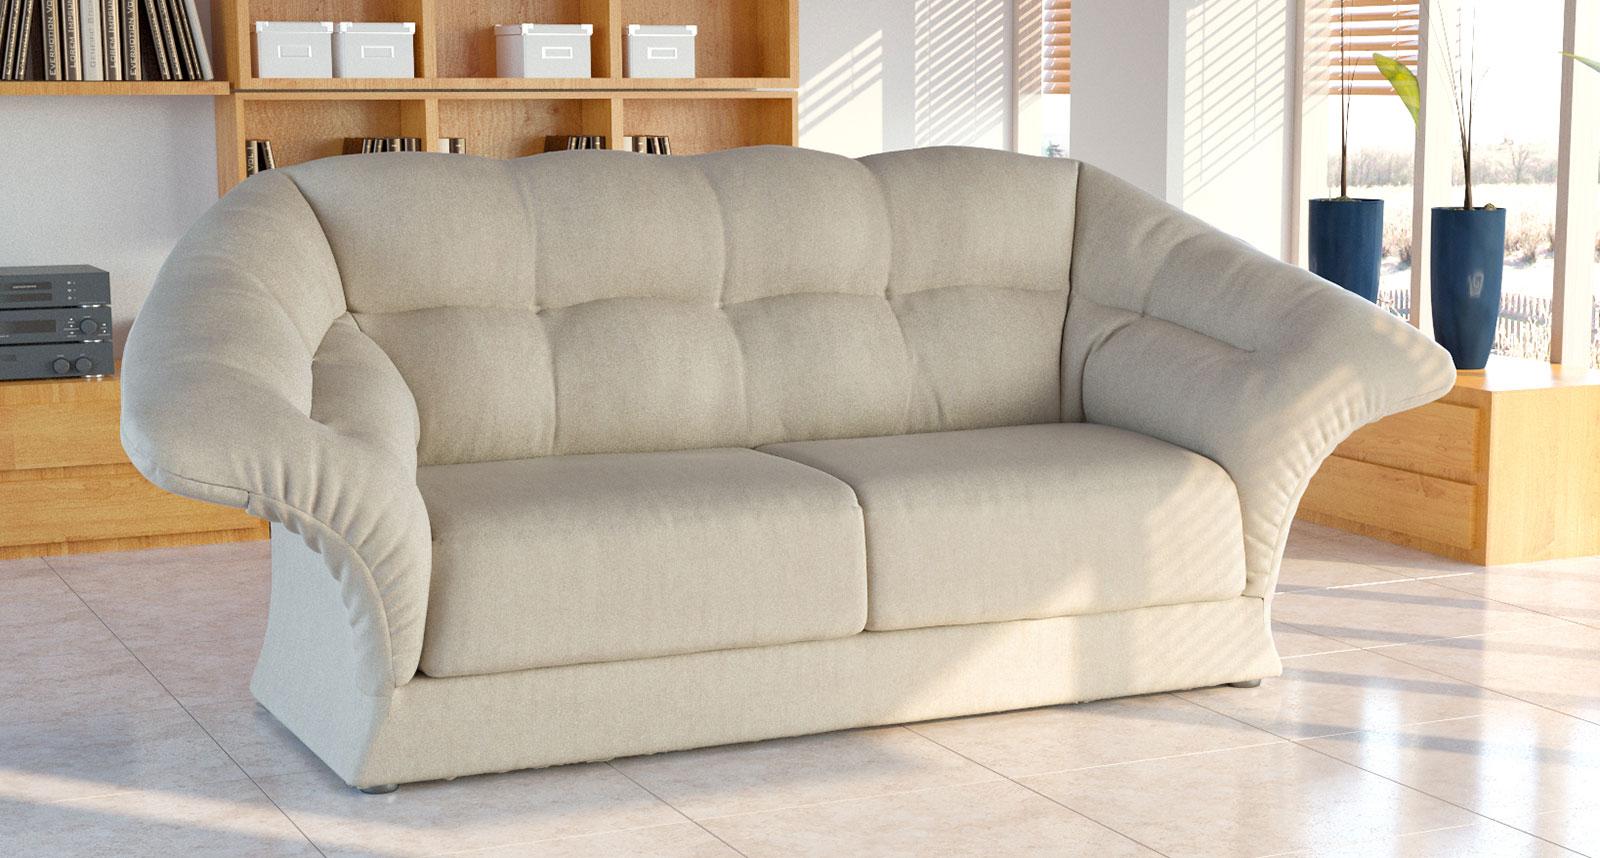 Купить диван раскладушка